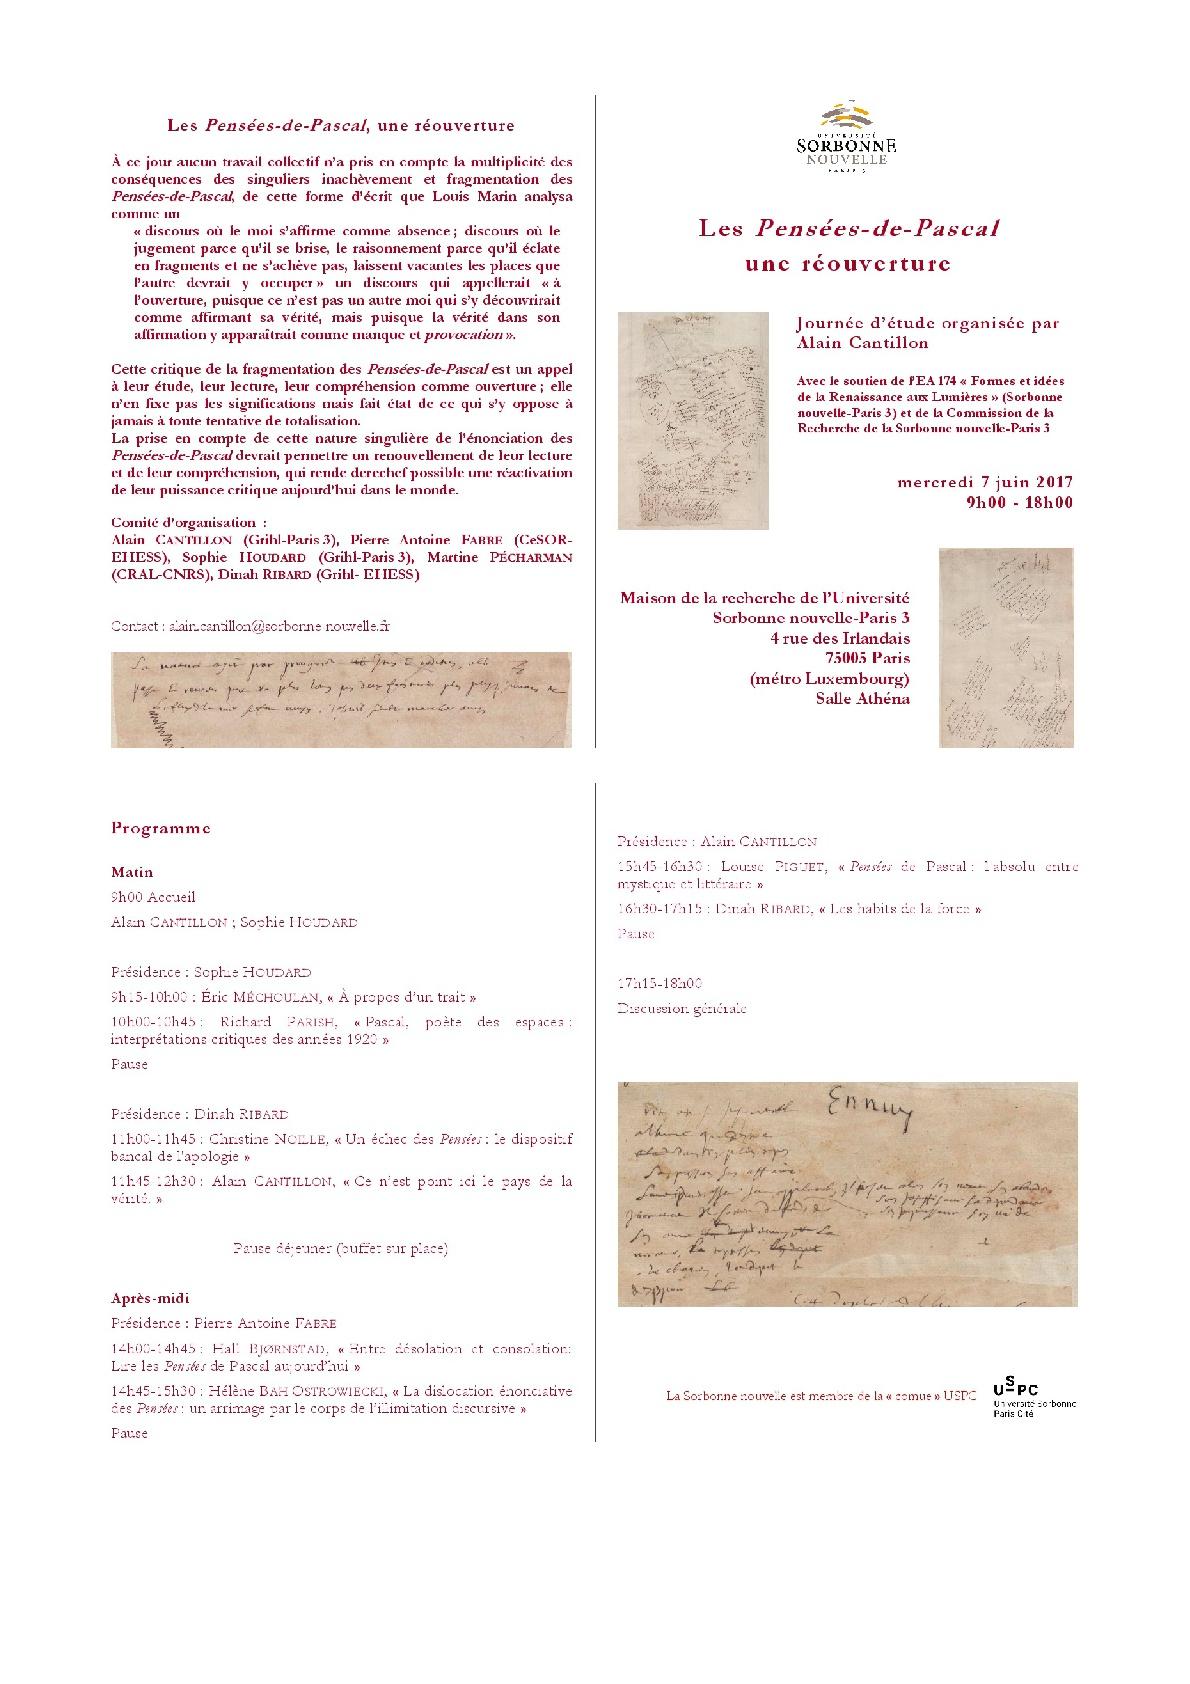 Programme Journée d'étude pascal-001 (1).jpg